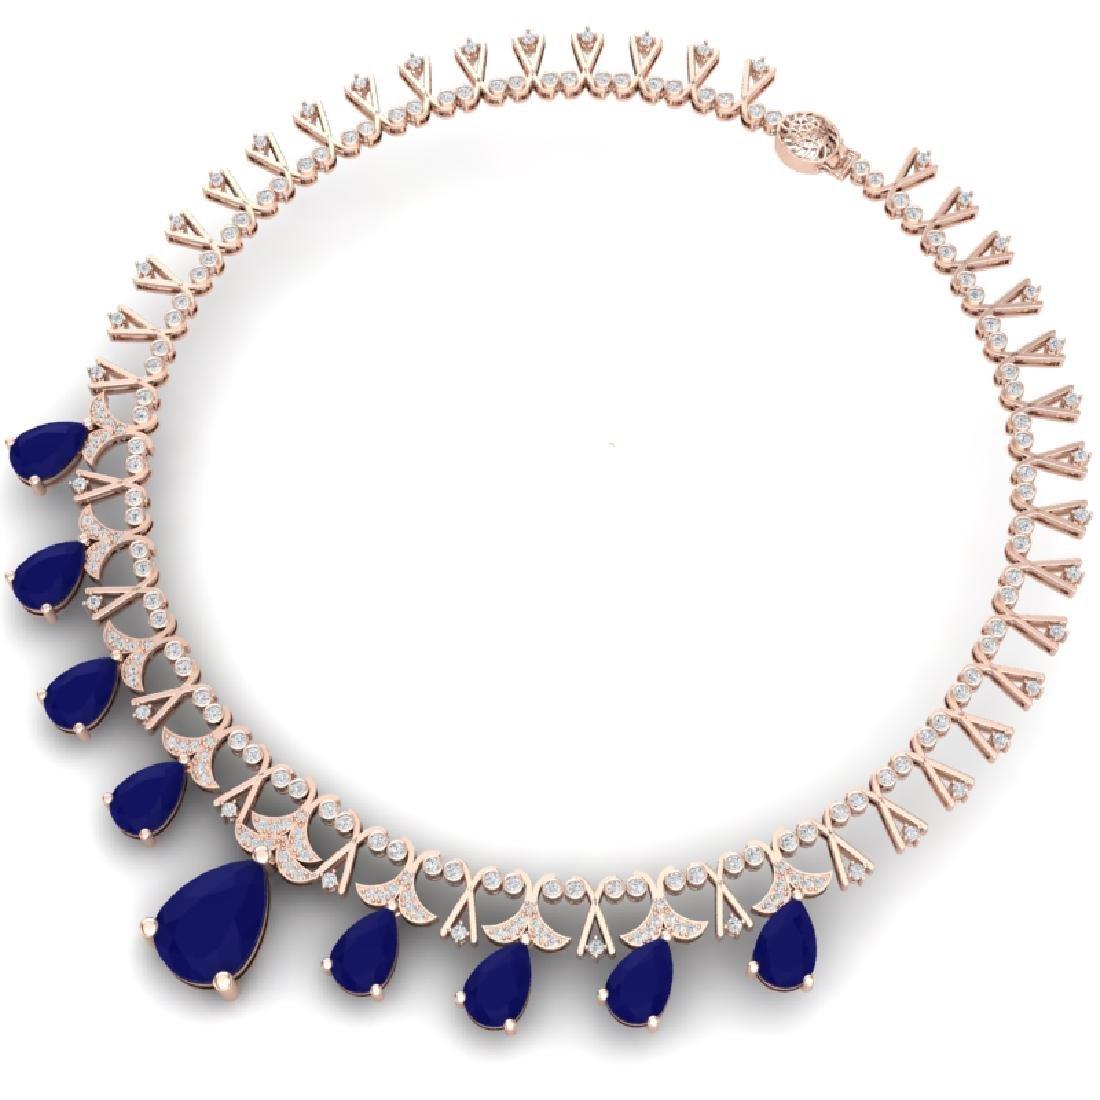 56.94 CTW Royalty Sapphire & VS Diamond Necklace 18K - 3